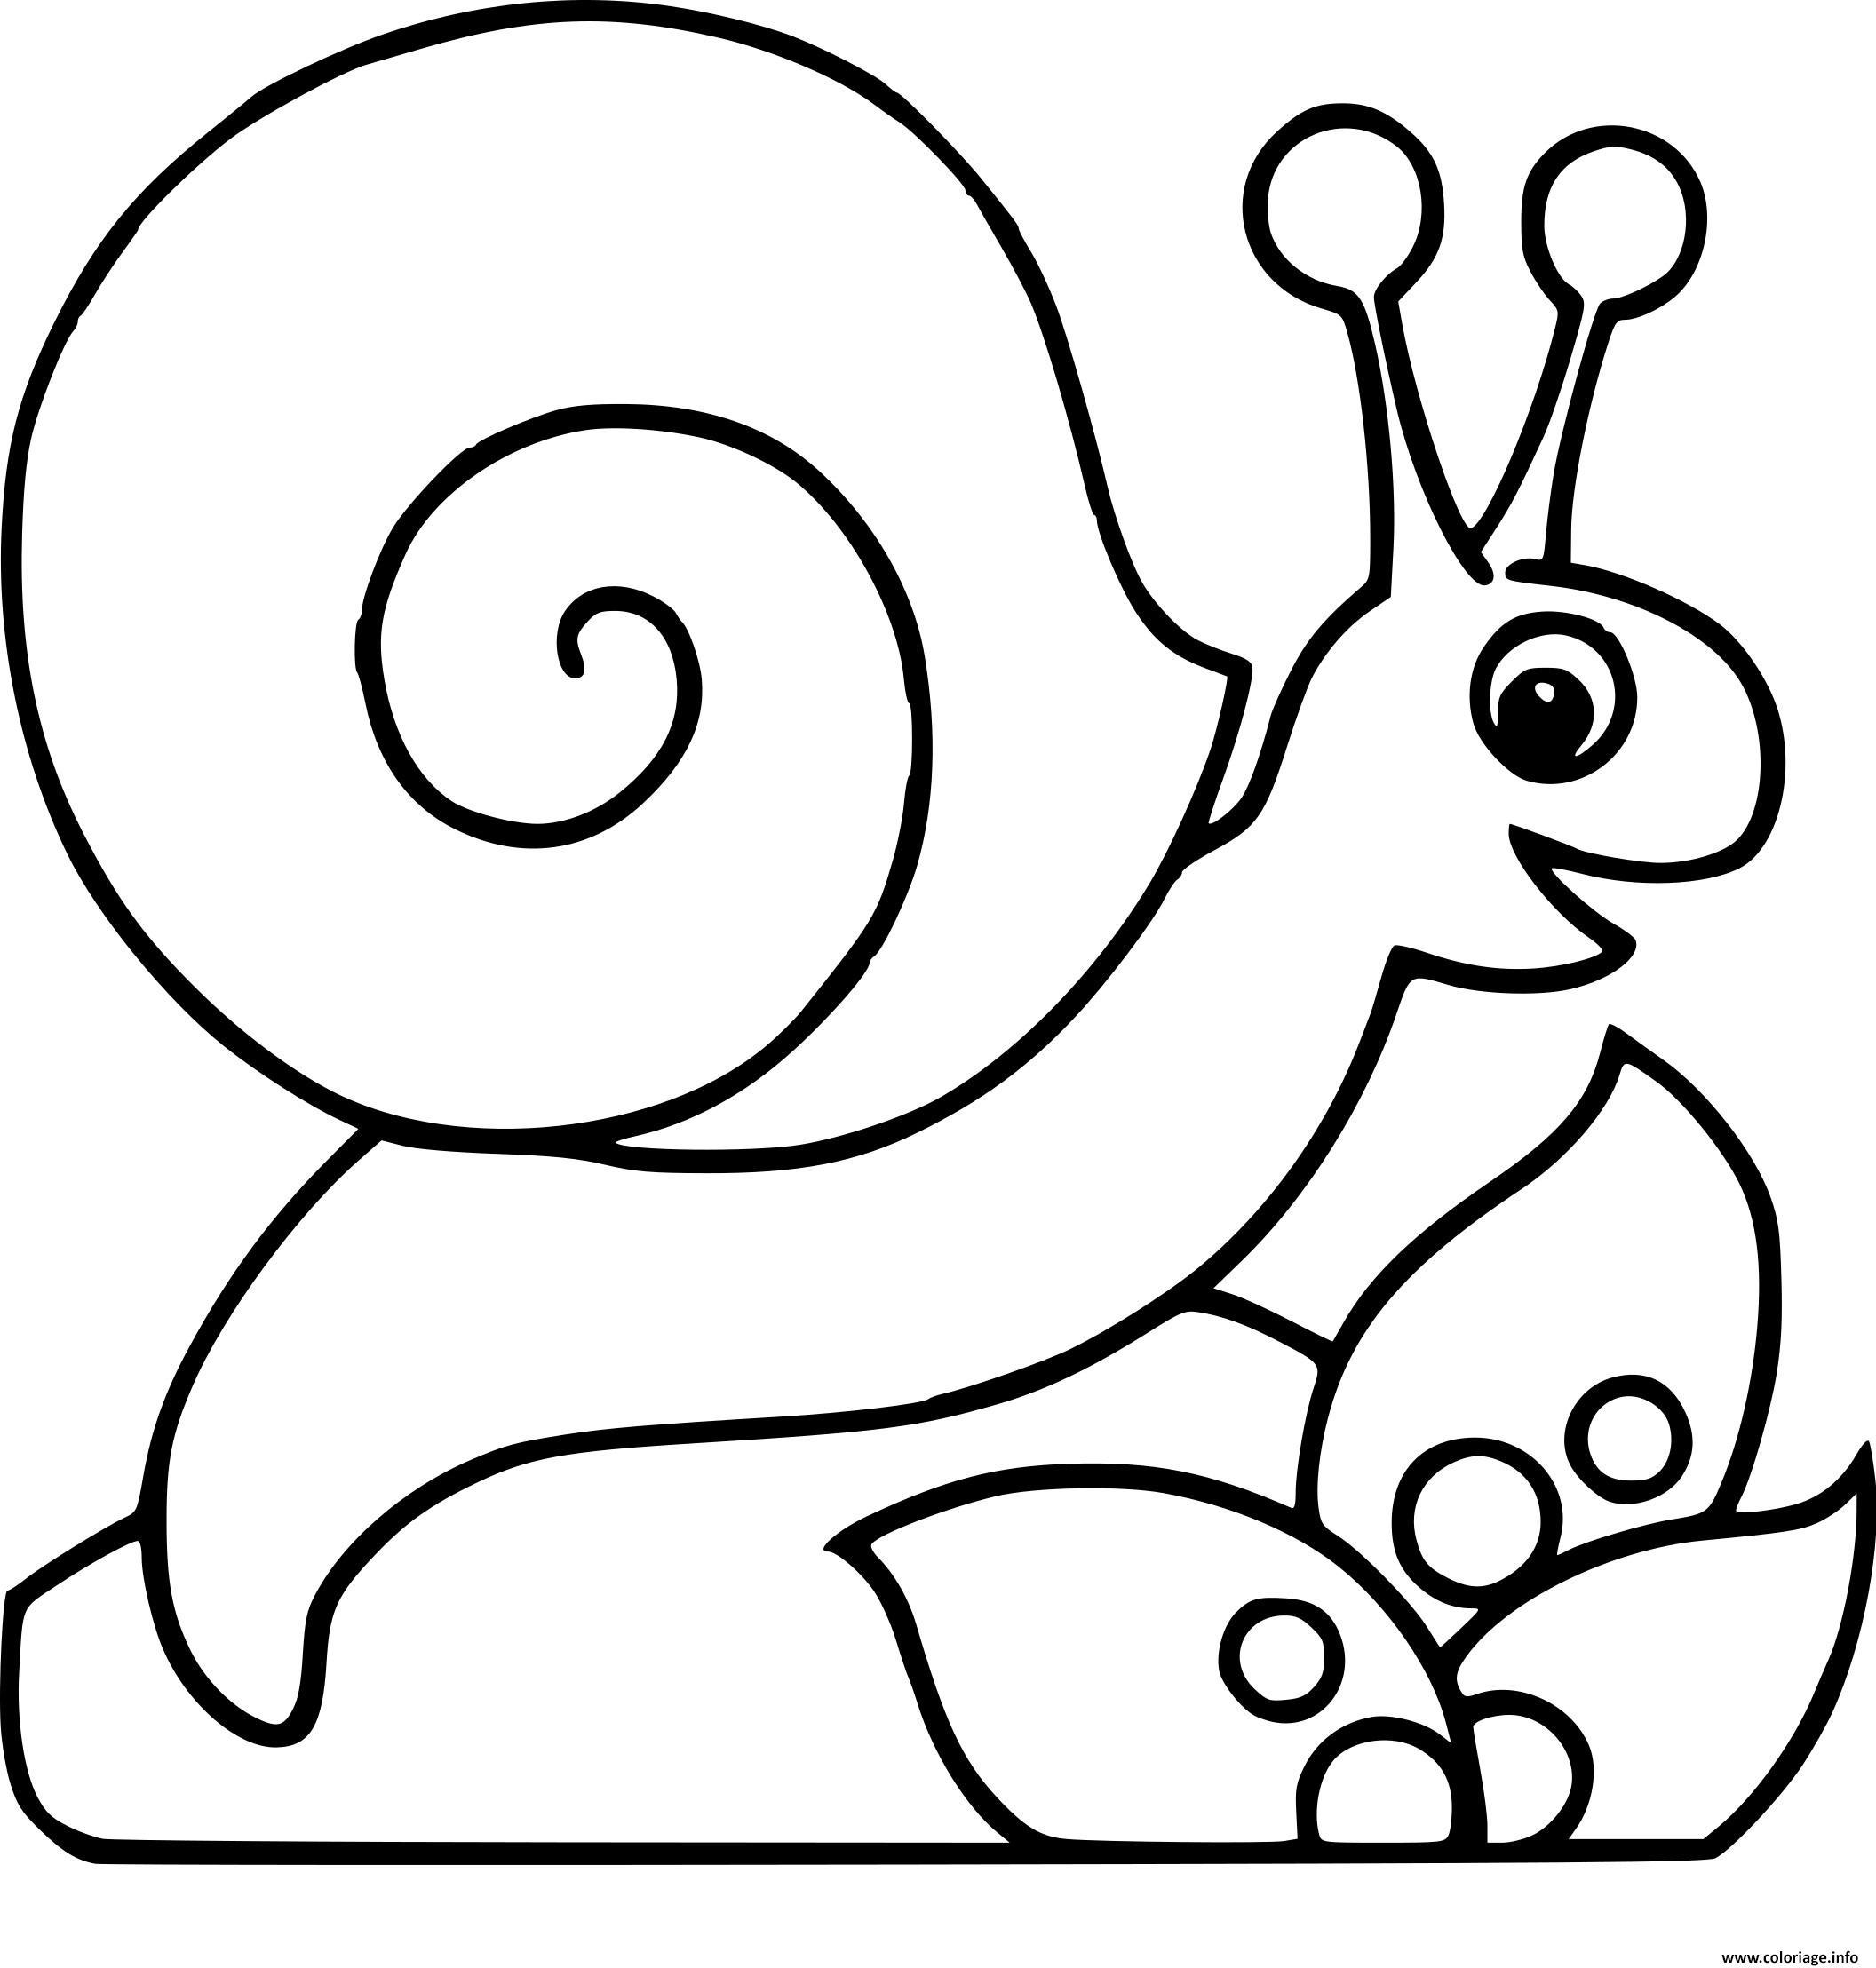 Coloriage Escargot Et Fleur Dessin Dessin Escargot A Imprimer